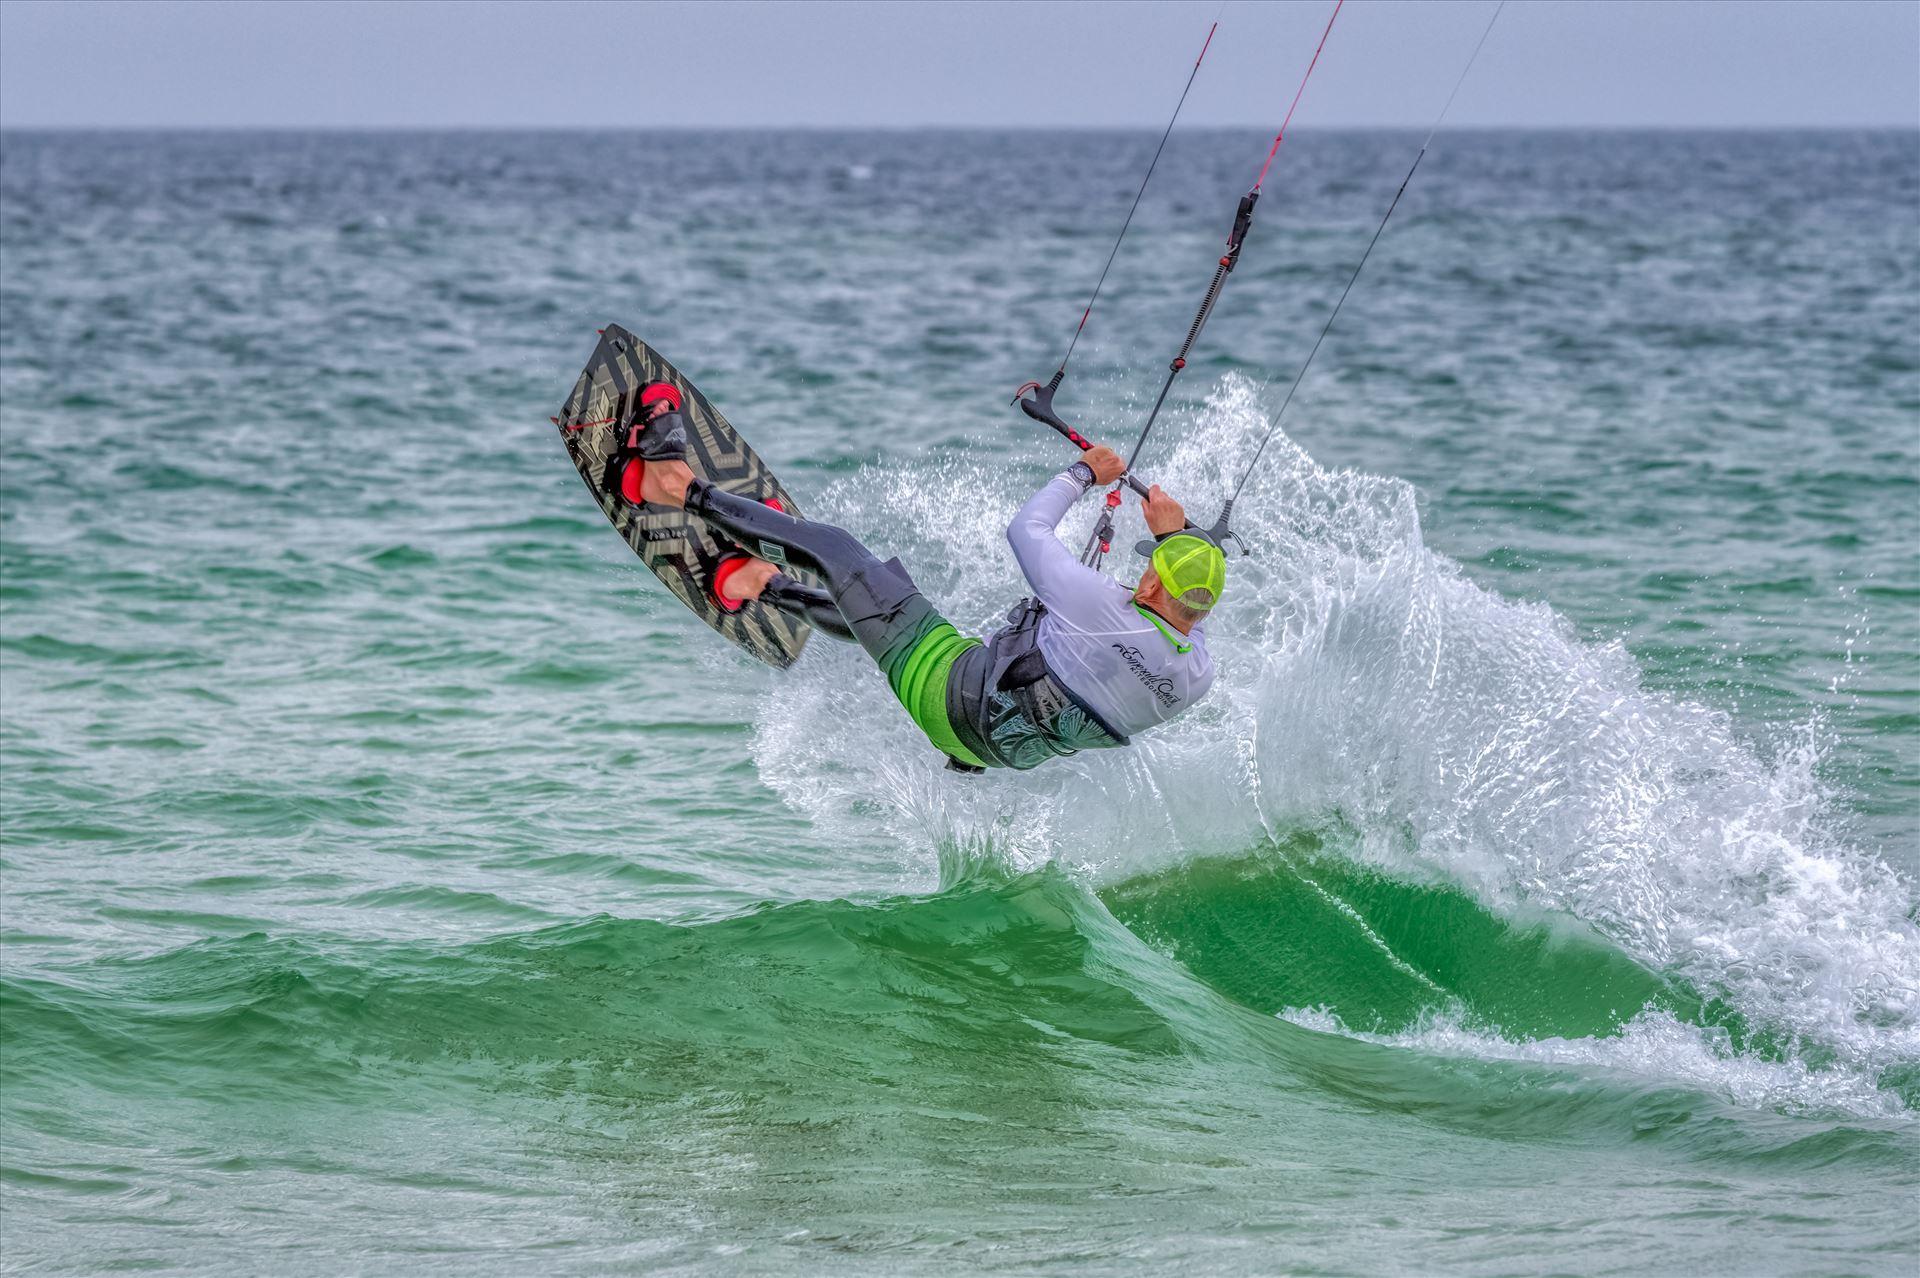 Emerald Coast Kiteboarding Kiteboarding at St. Andrews State Park, Panama City, Florida by Terry Kelly Photography